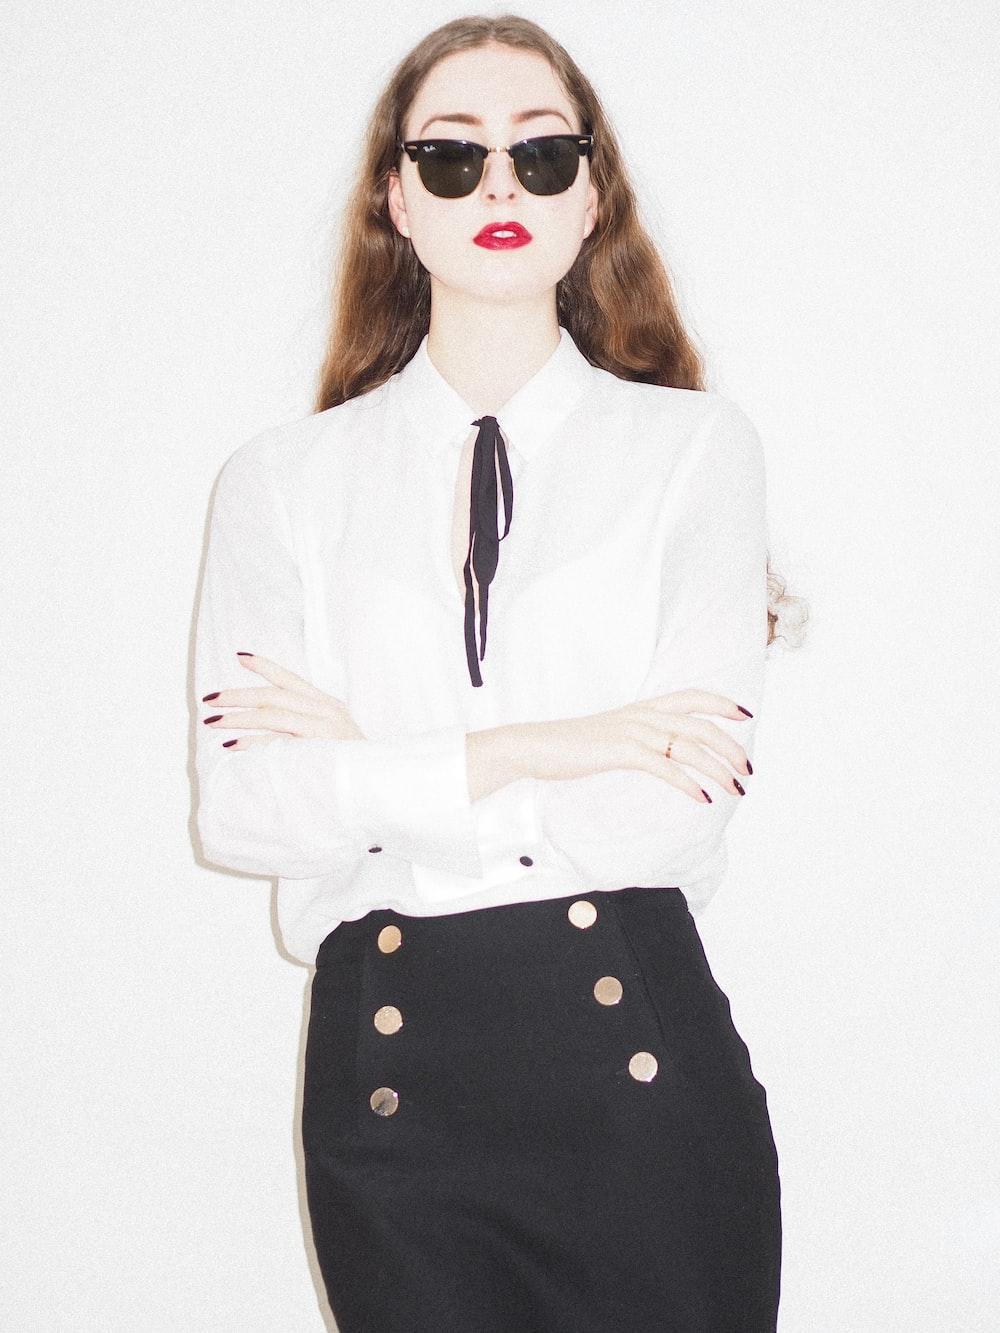 woman in white blazer wearing sunglasses